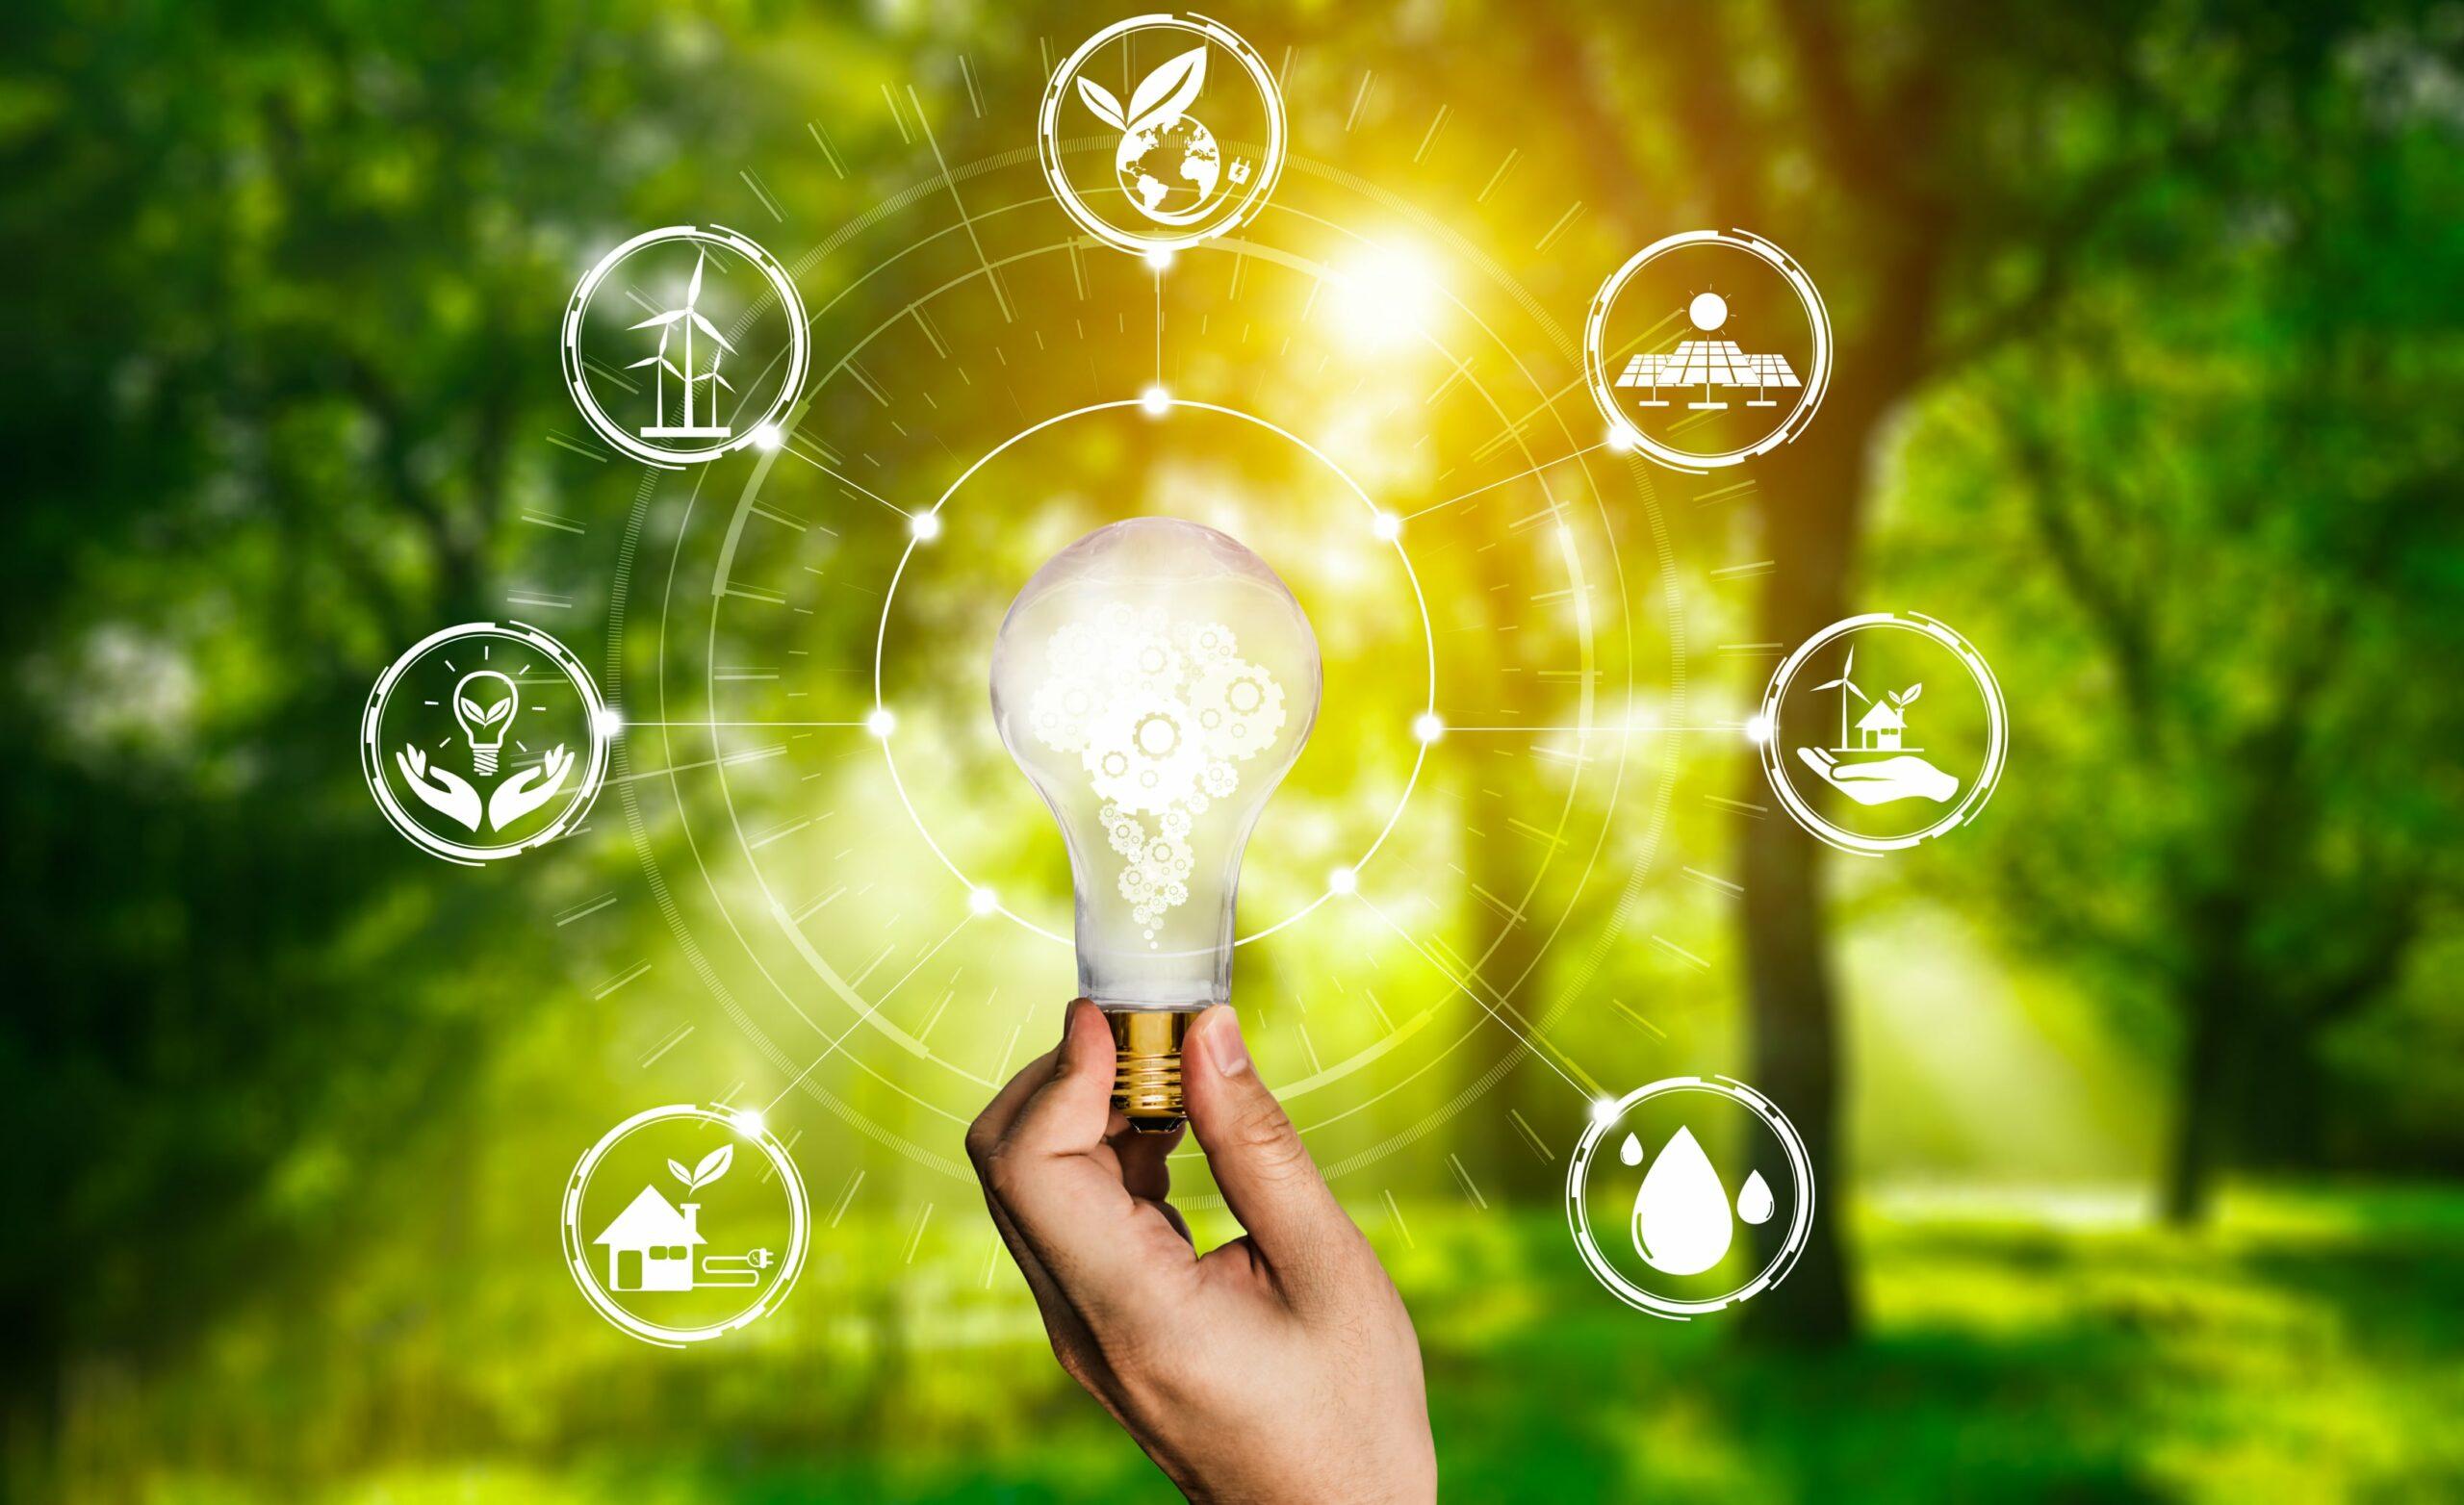 https://doradcy365.pl/wp-content/uploads/2020/10/energy-innovation-light-bulb-graphic-interface-min-scaled.jpg